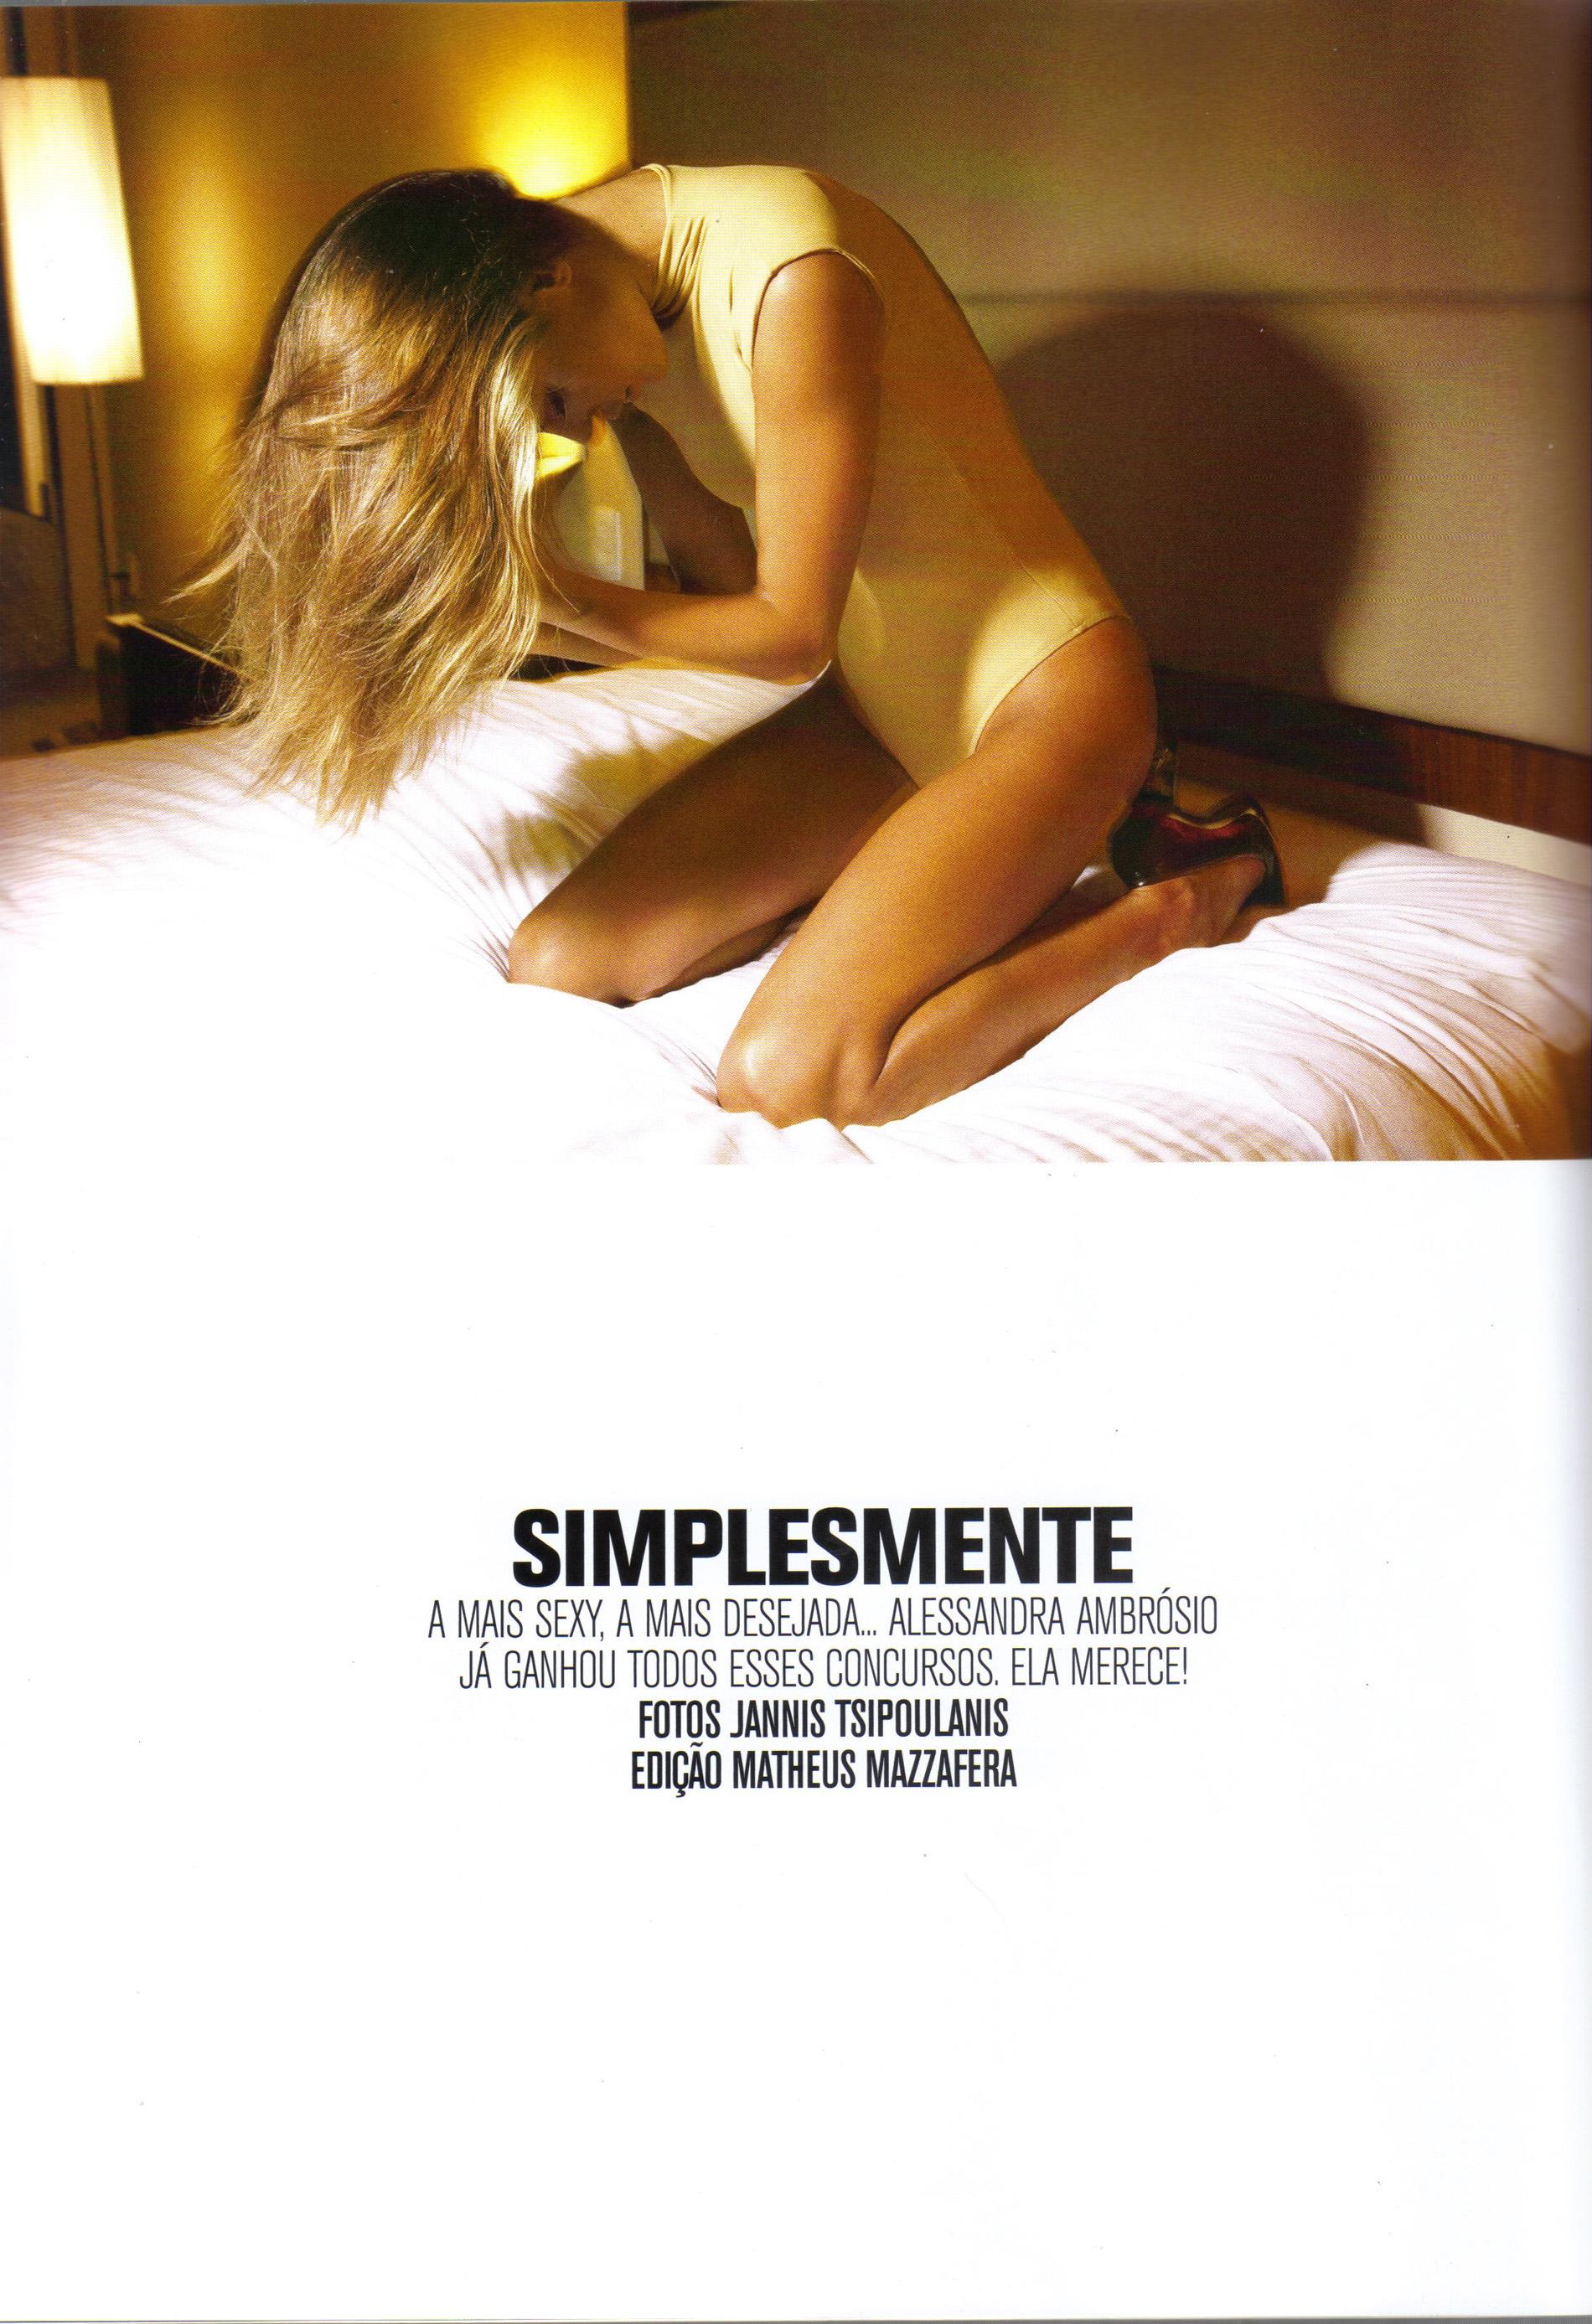 02768_Alessandra_Ambrosio_Homem_Vogue-2_122_192lo.jpg